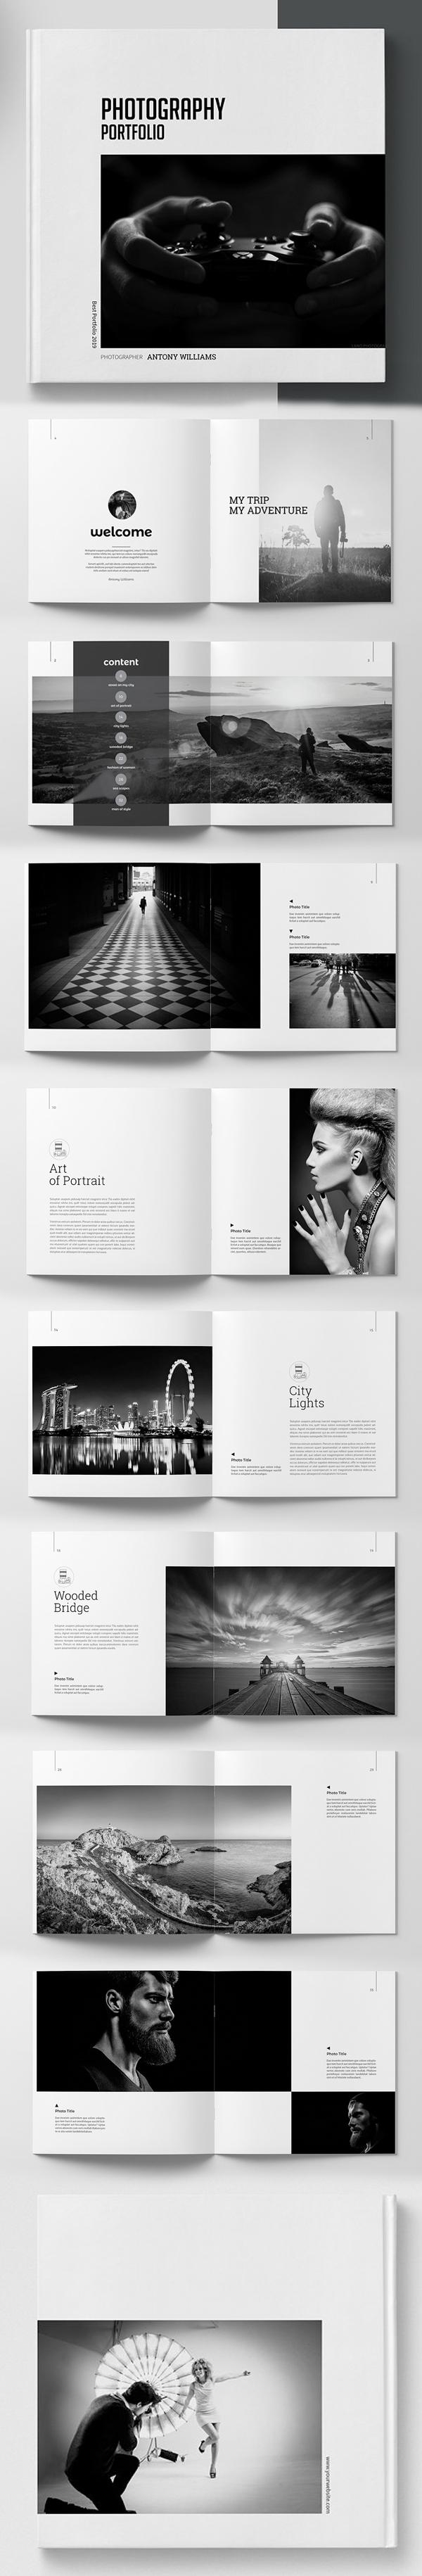 Photography Square Portfolio Template